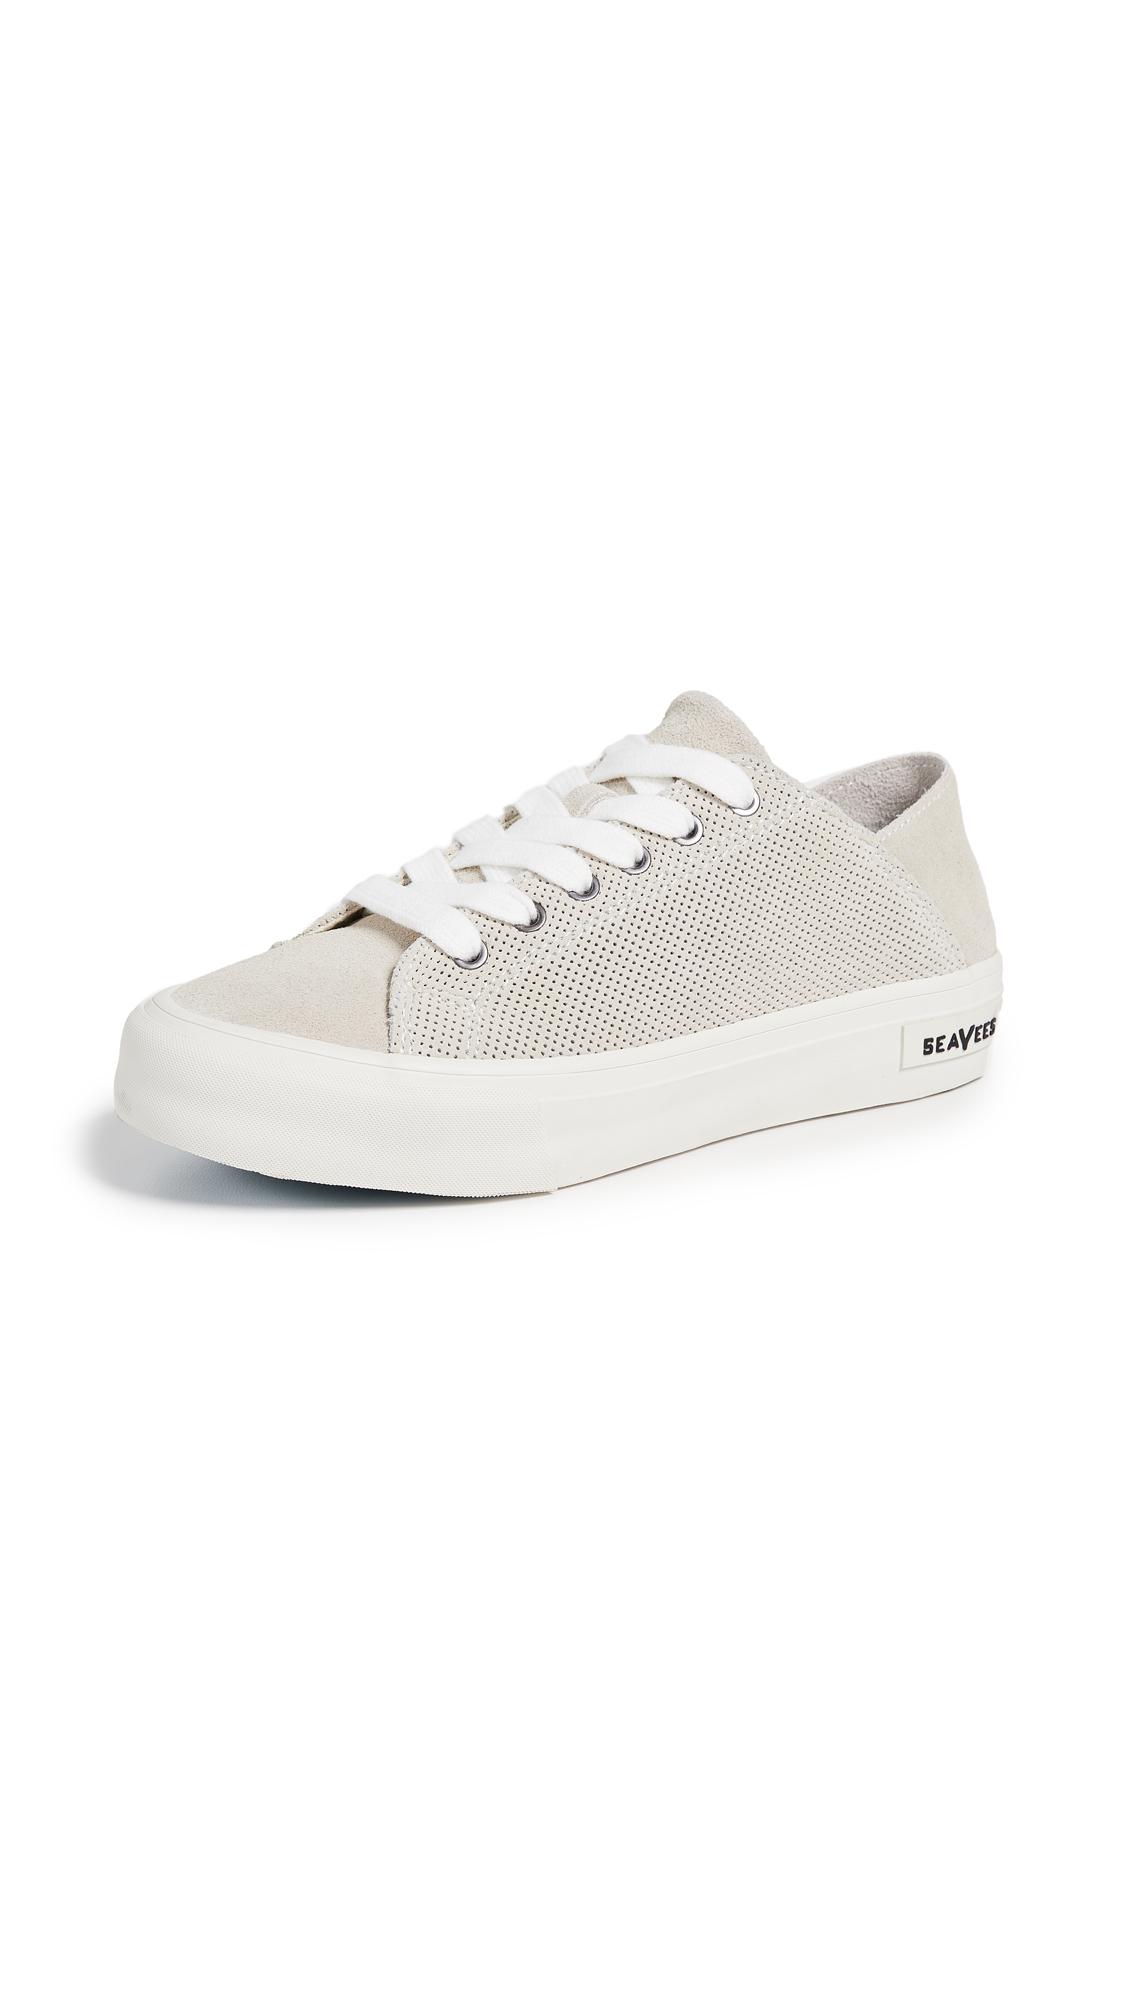 SeaVees Sausalito Convertible Sneakers - Ecru